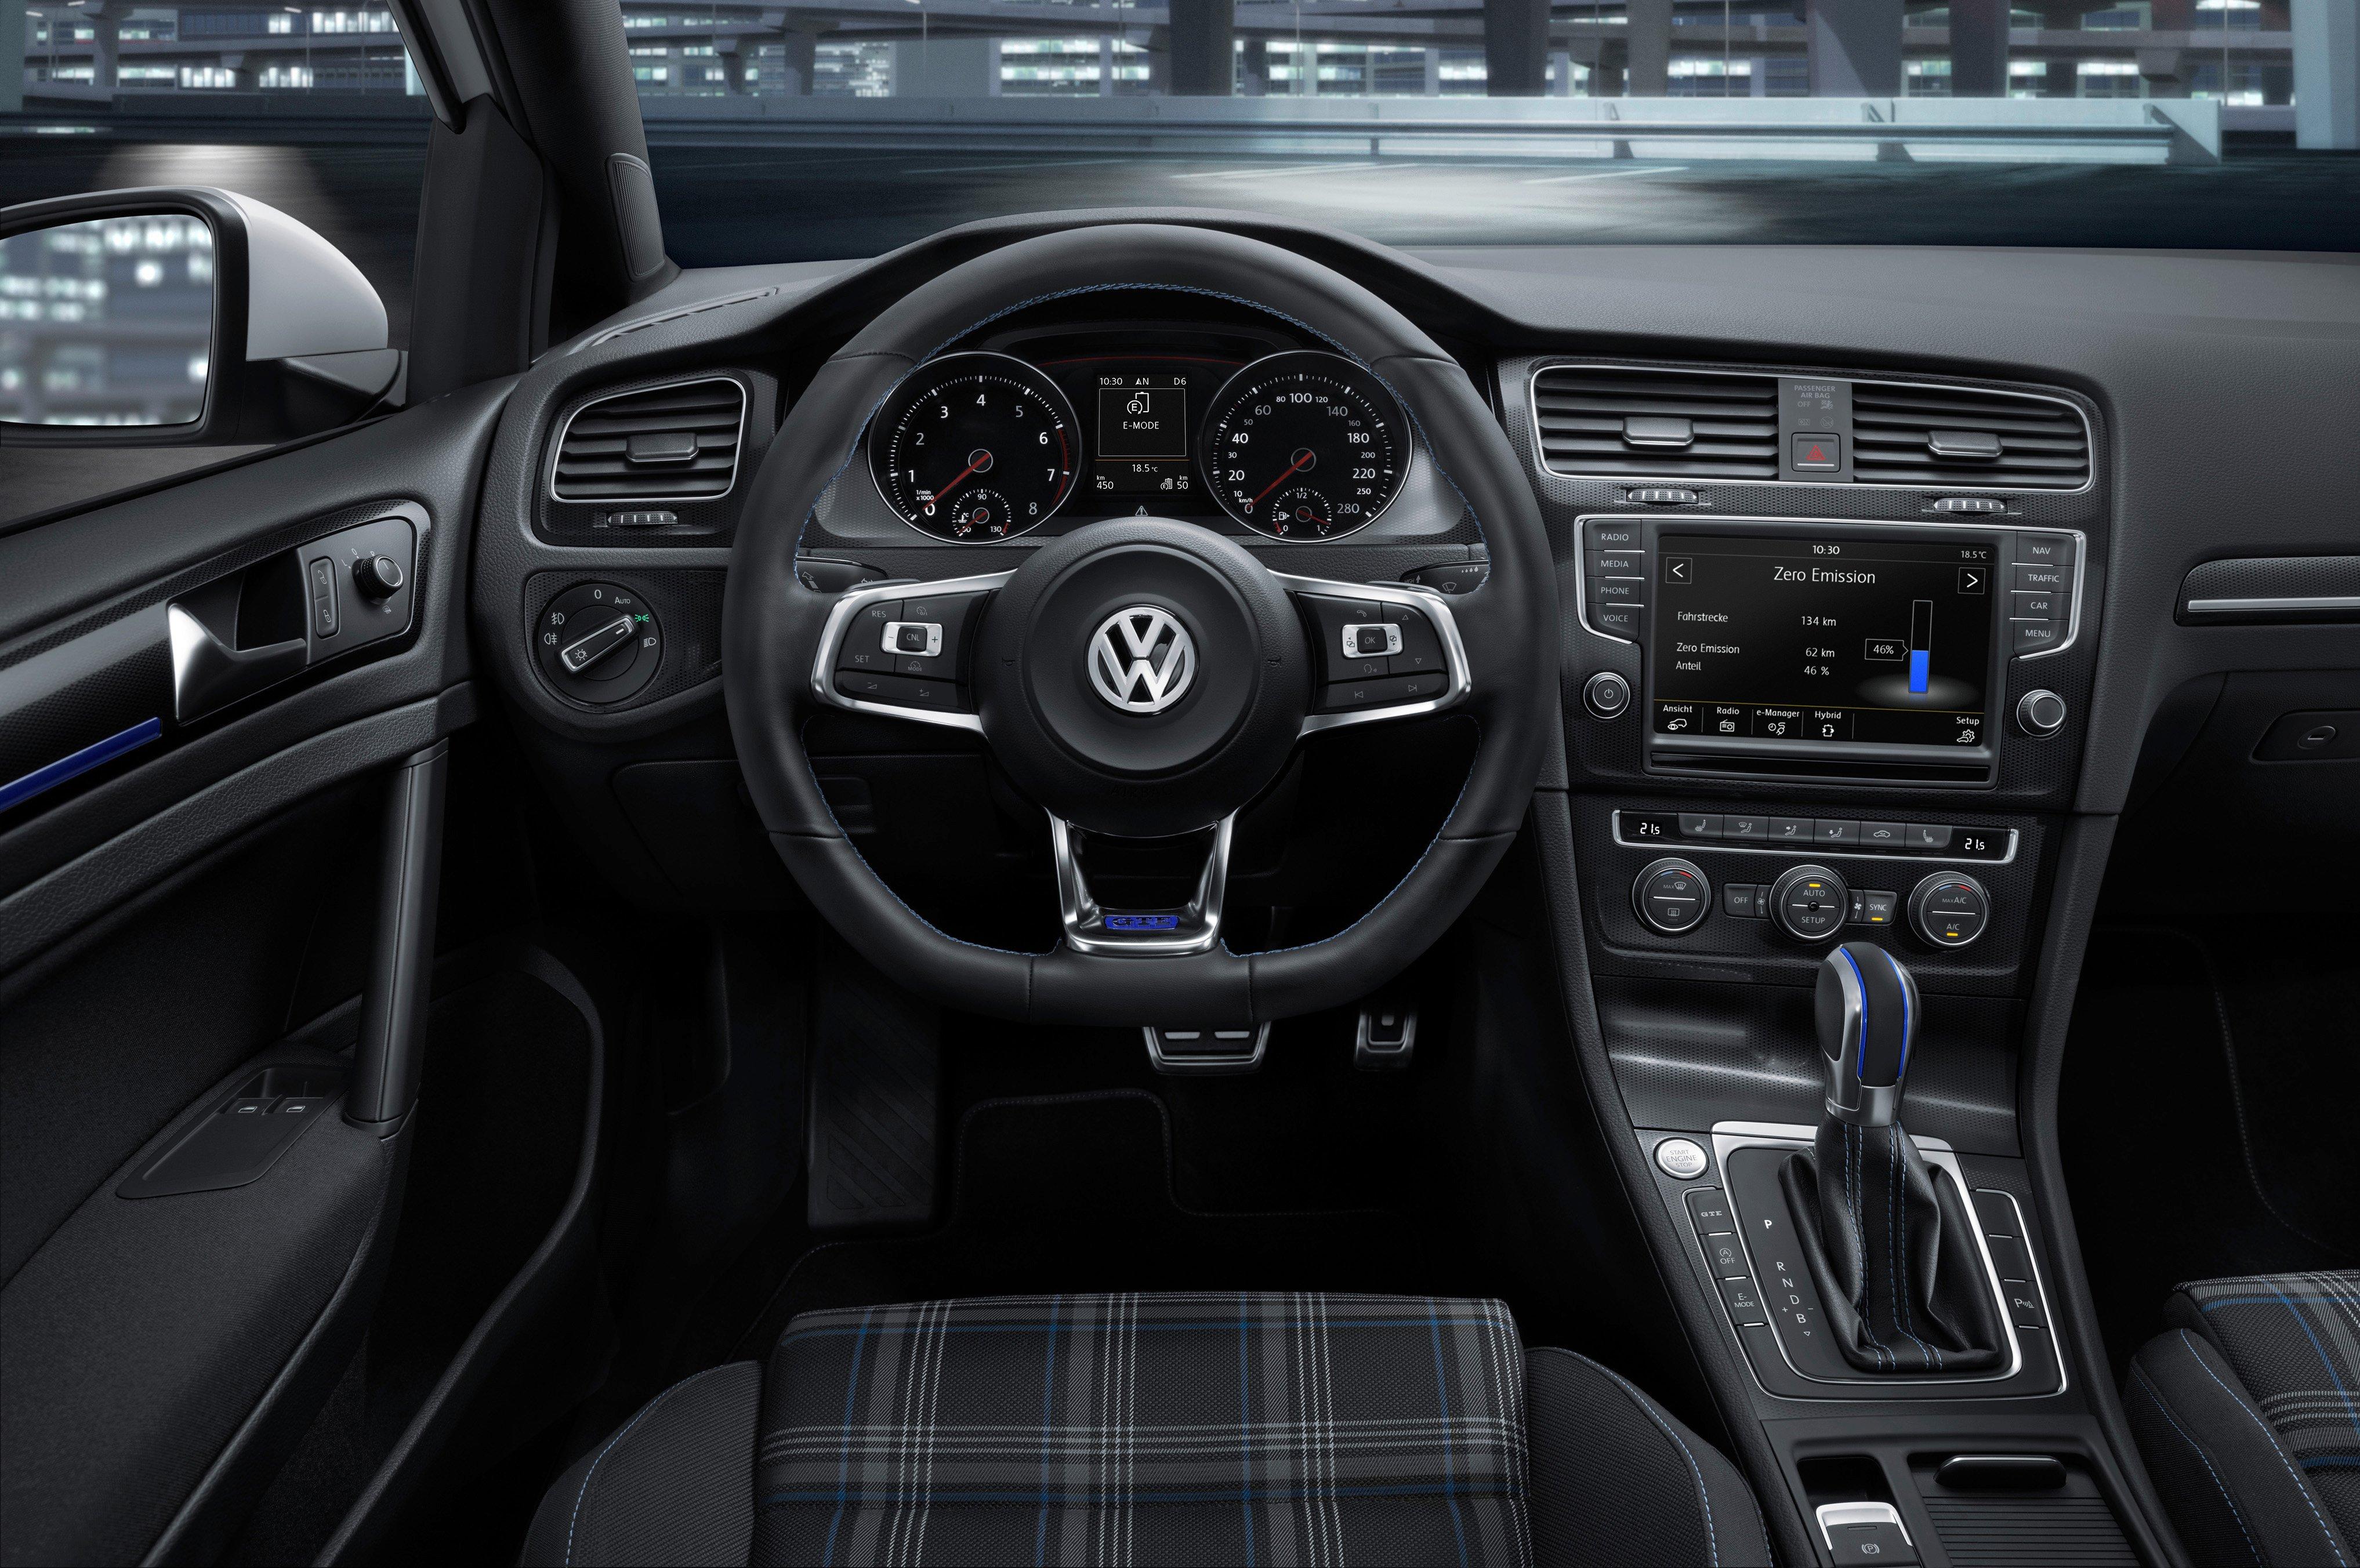 HD Volkswagen Modele Golf 6 GTI Vue Interieur Img Volkswagen Golf 6 GTI 507 likewise Wallpaper 09 additionally New Volkswagen Polo Gti 2018 Review Pictures 1 likewise Volkswagen New Pricelist as well VW Scirocco w wojskowych barwach 2 585 1. on volkswagen polo gti